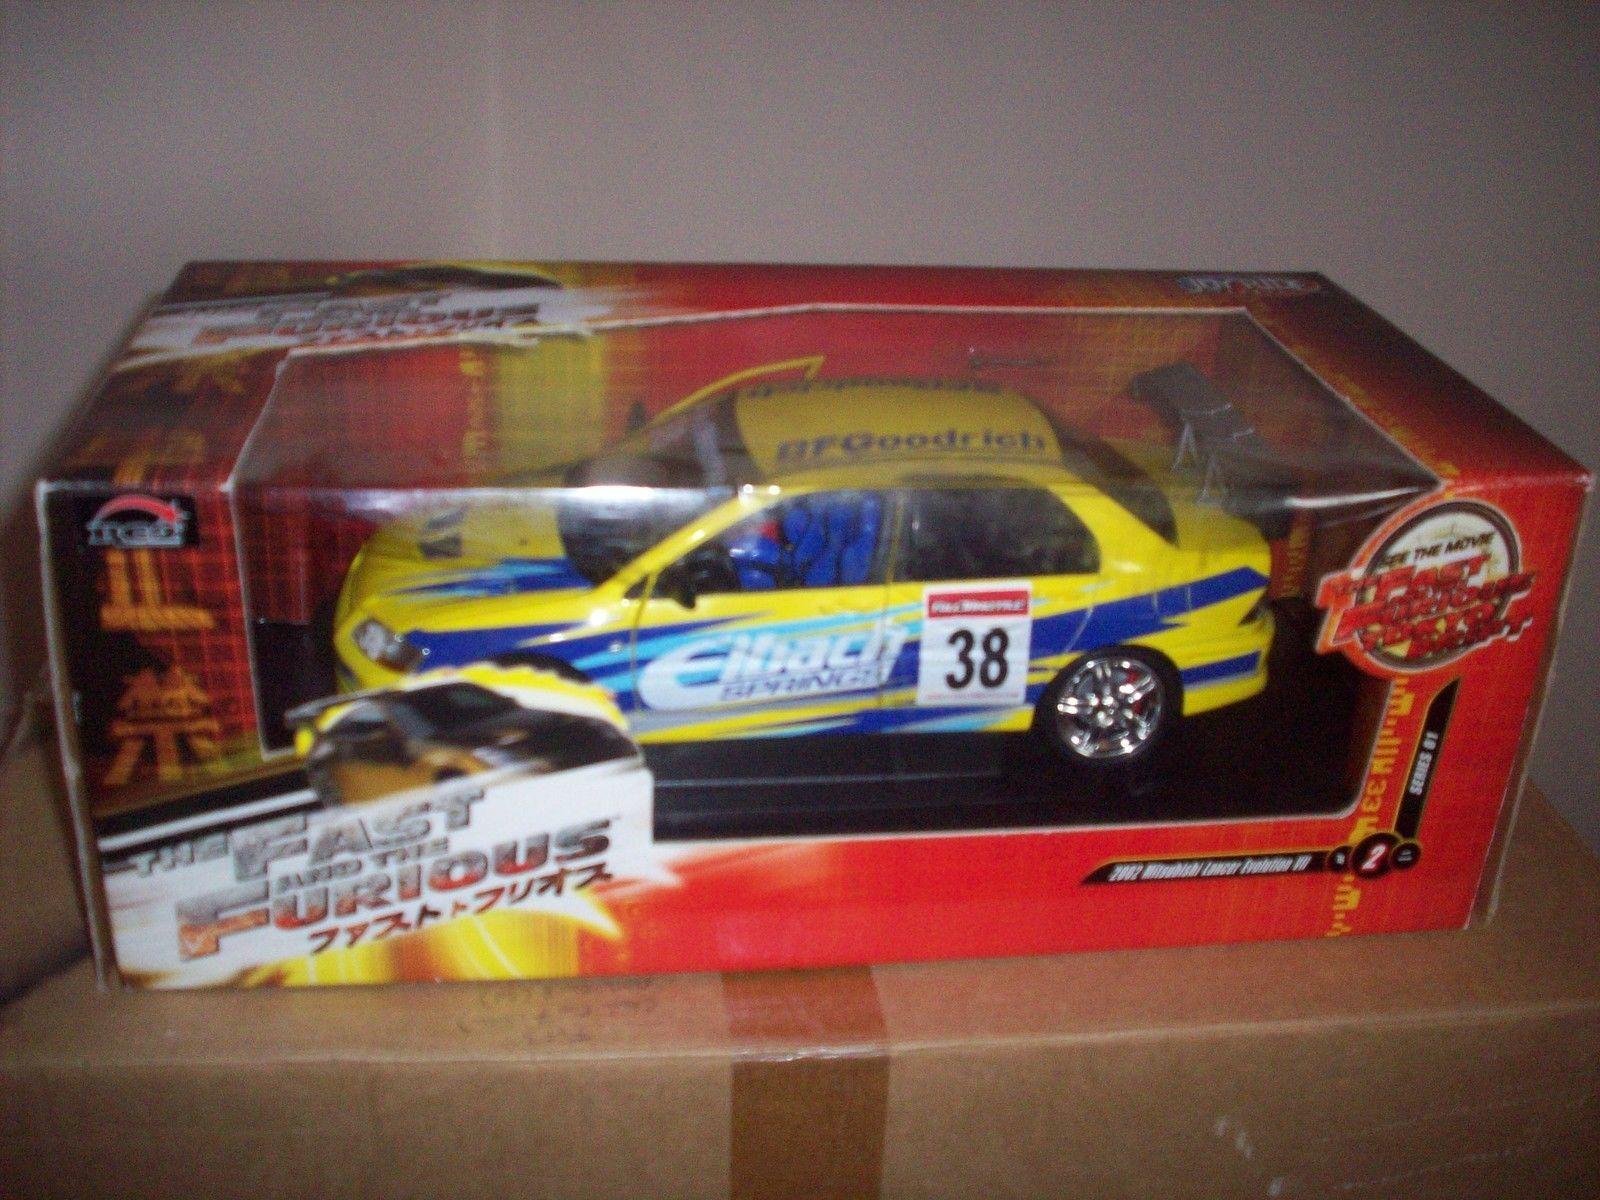 1:18 Fast and Furious Tokyo Drift Mitsubishi Evo VII Series 01 No2 | eBay